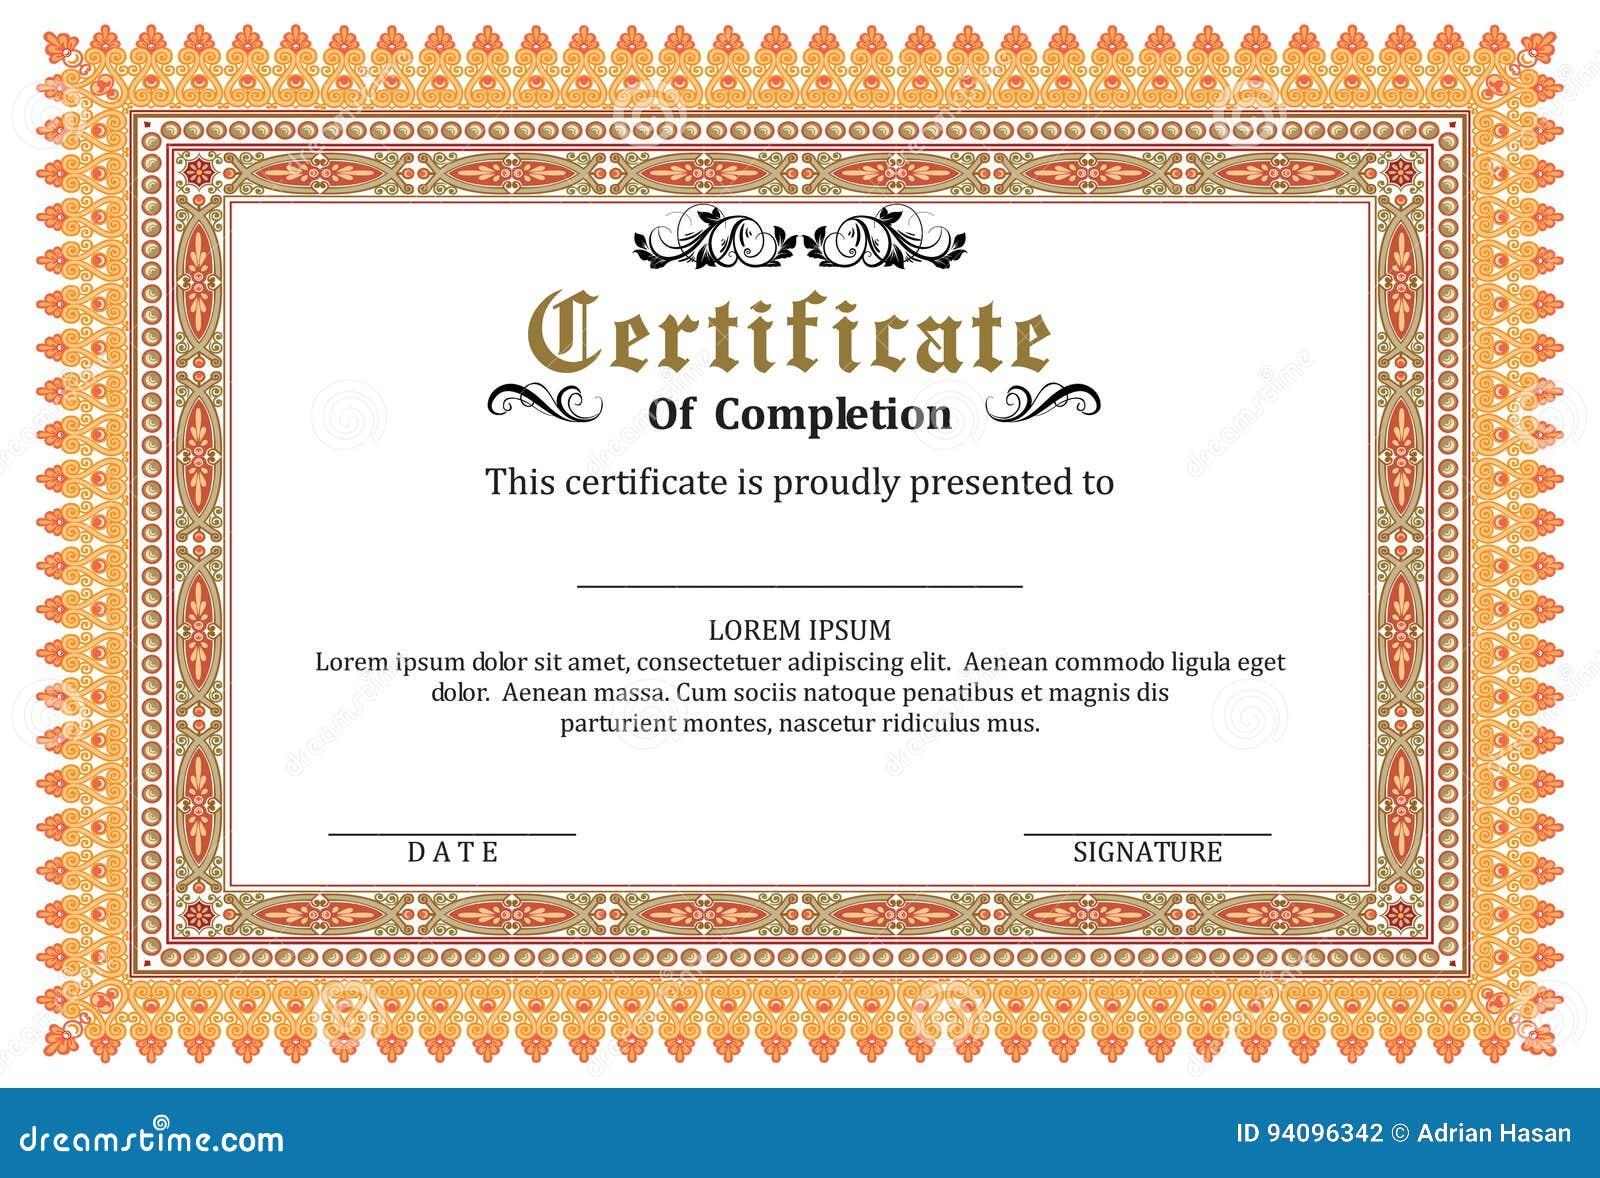 certificate frame template vector award stock vector illustration of fancy degree 94096342 dreamstime com